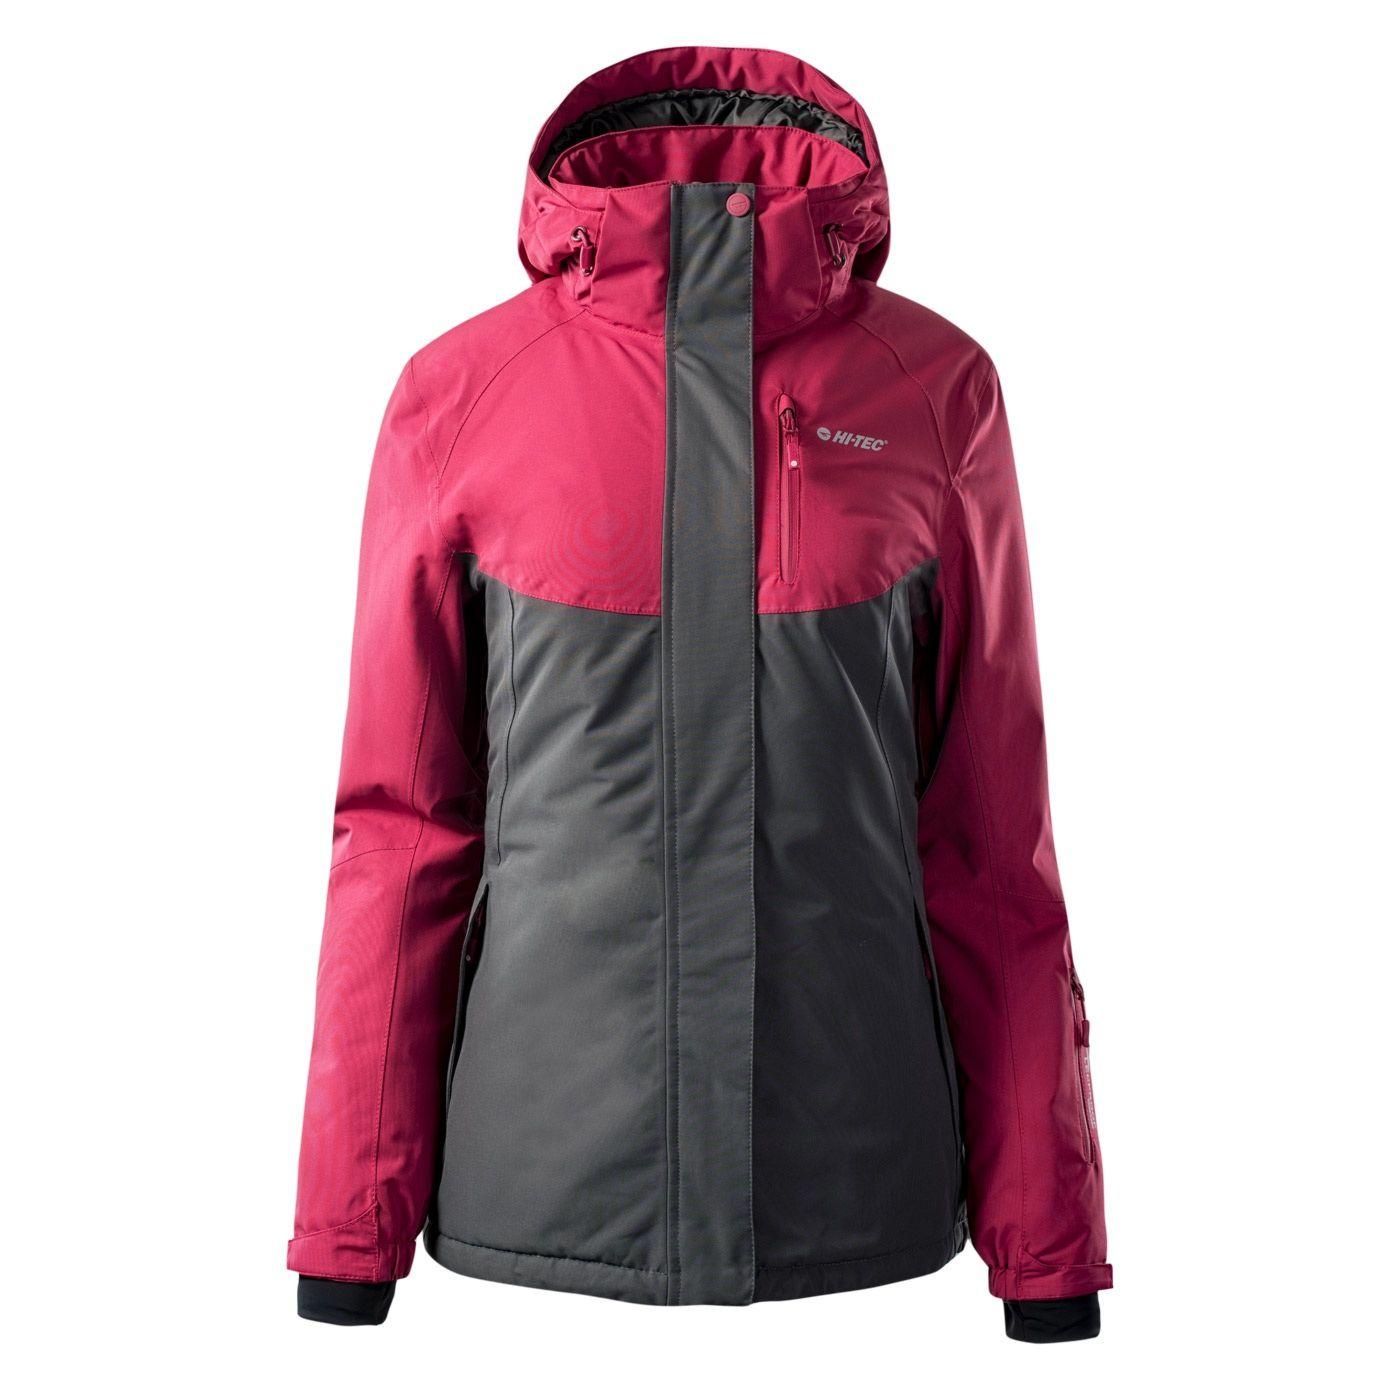 Damska kurtka narciarska